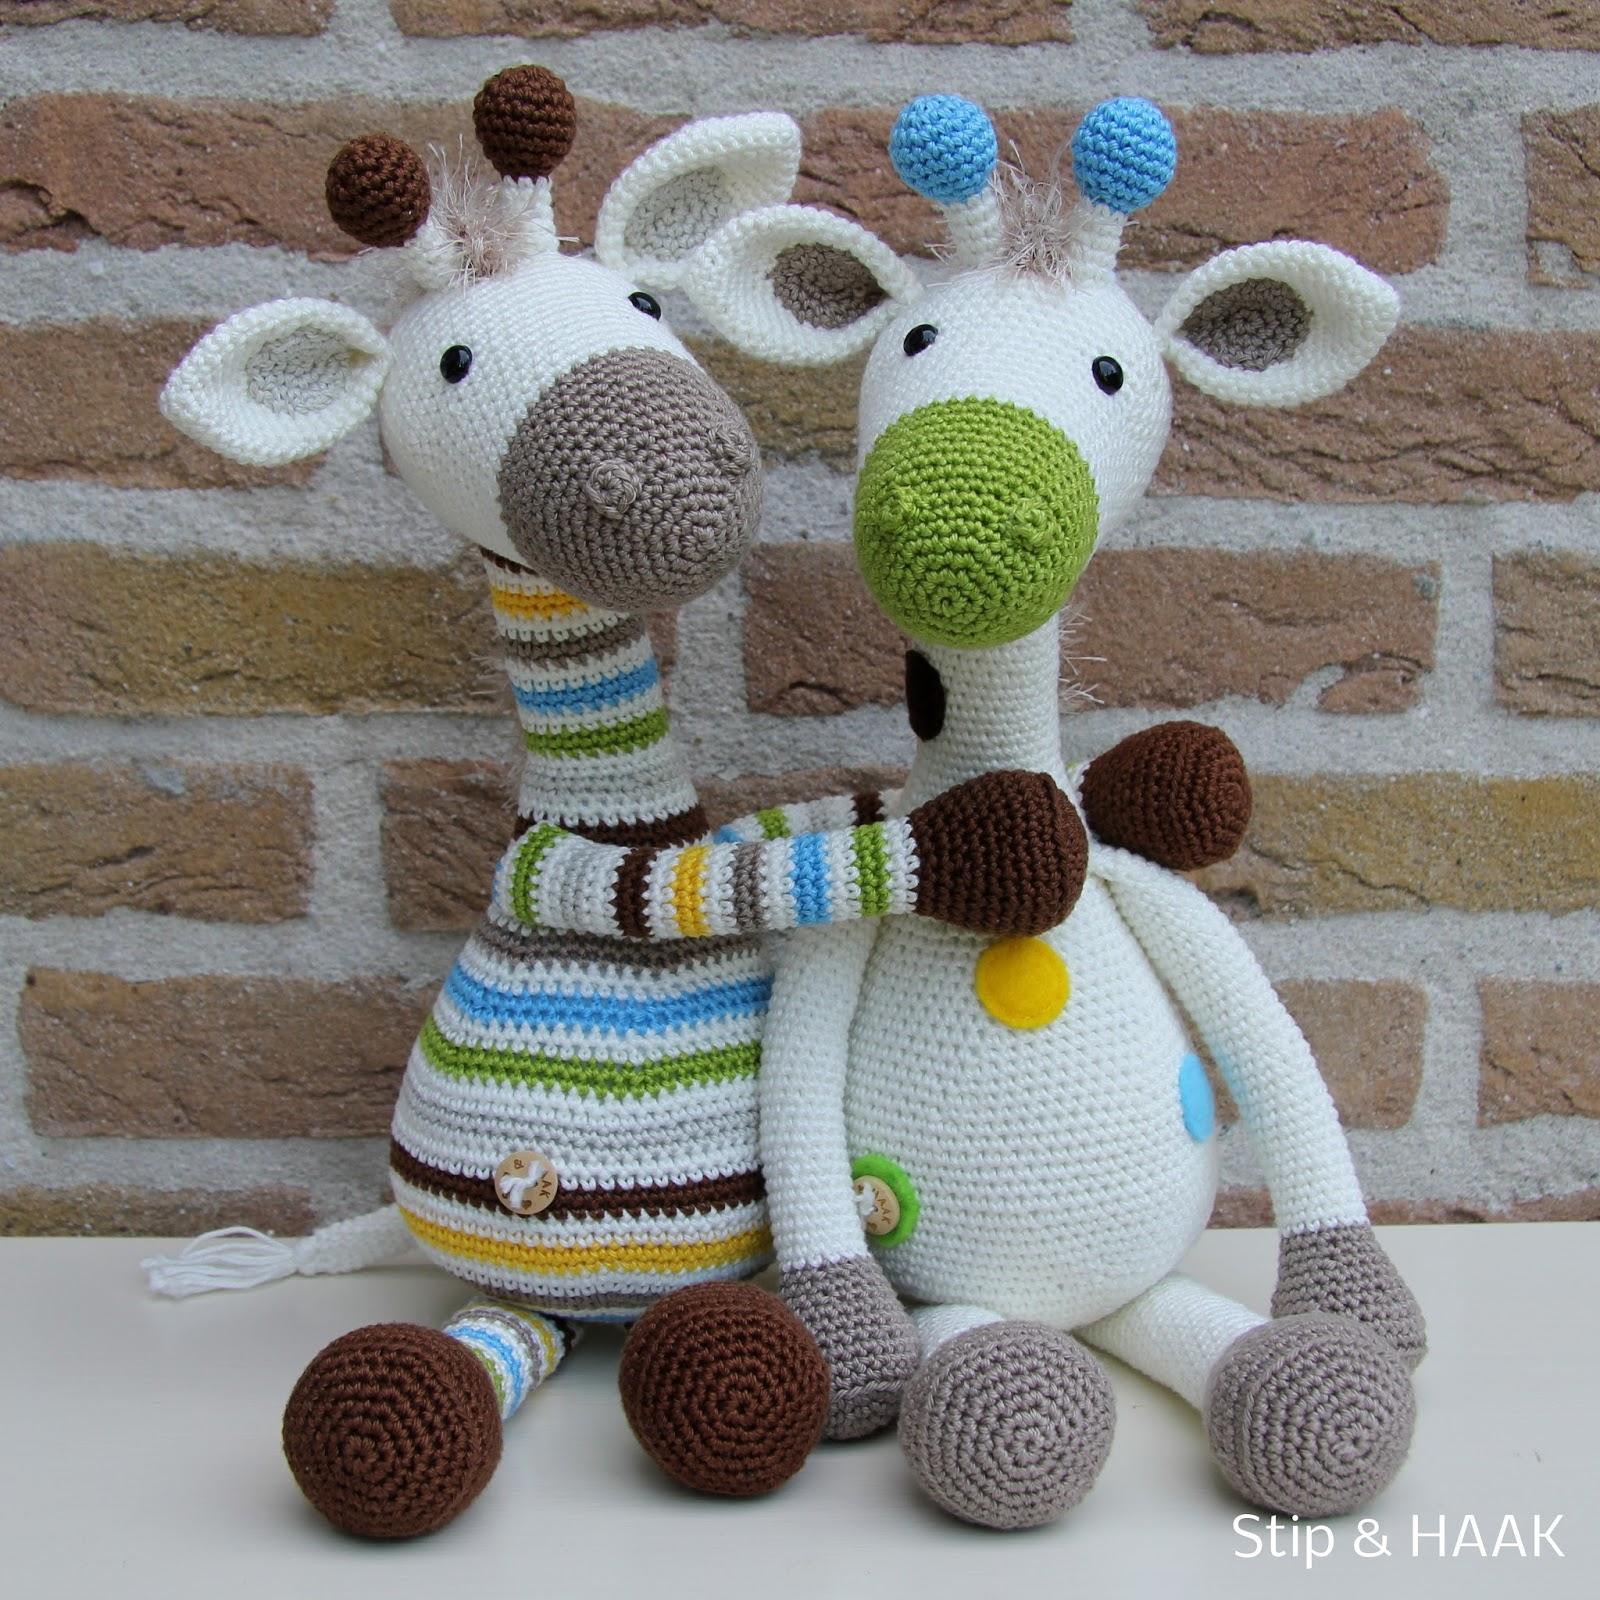 Amigurumi Giraffe Haken : Stip & HAAK: Giraffe Gijs